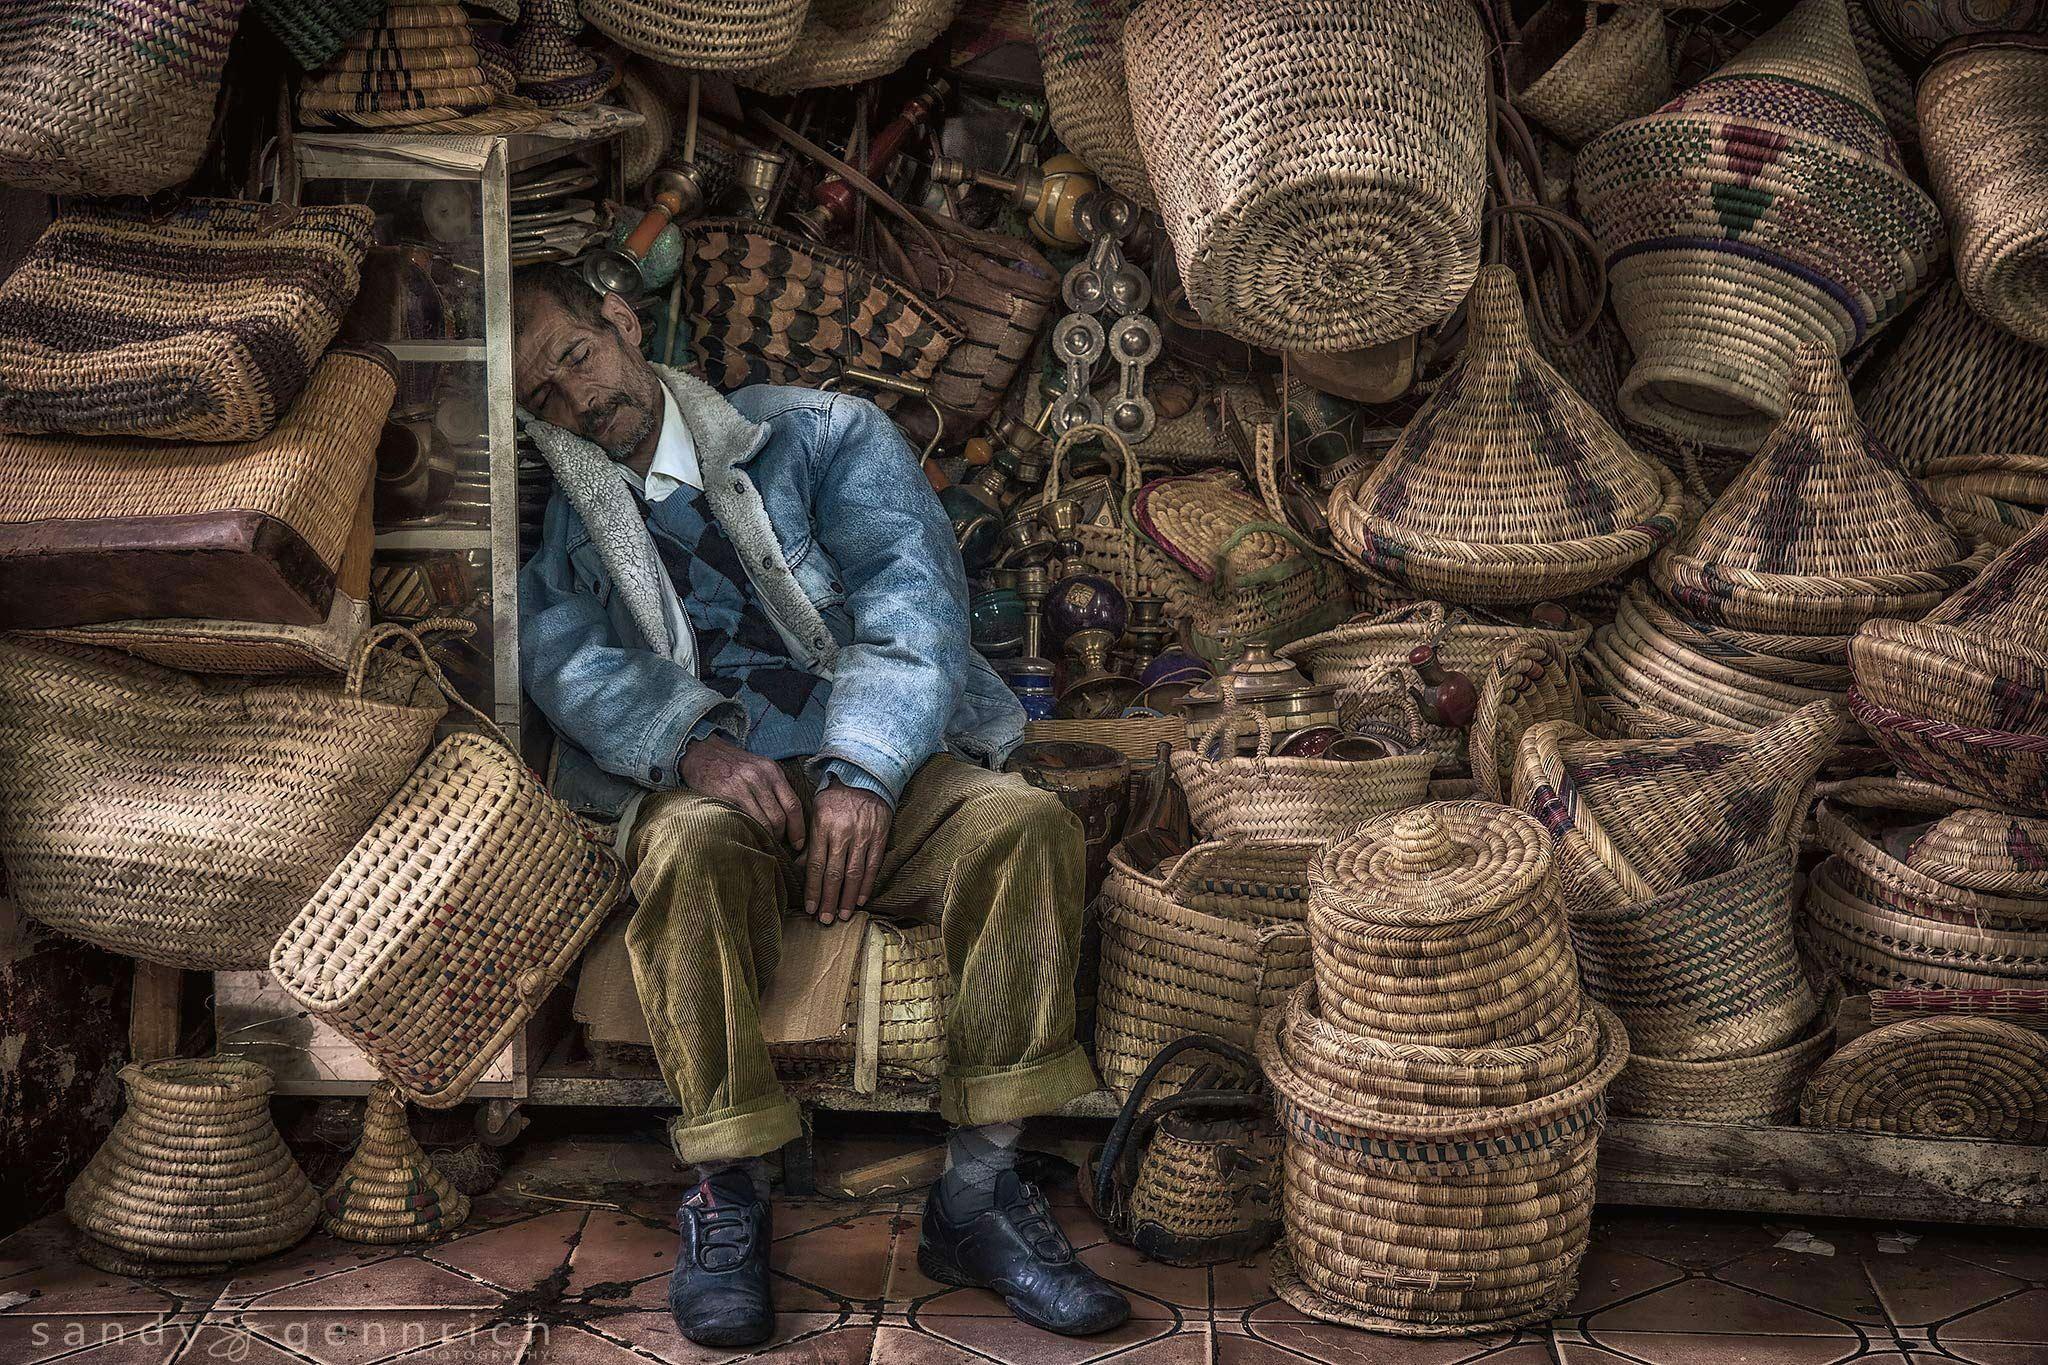 A Long Days Work-Marrakech-Morocco by Sandy Gennrich on 500px